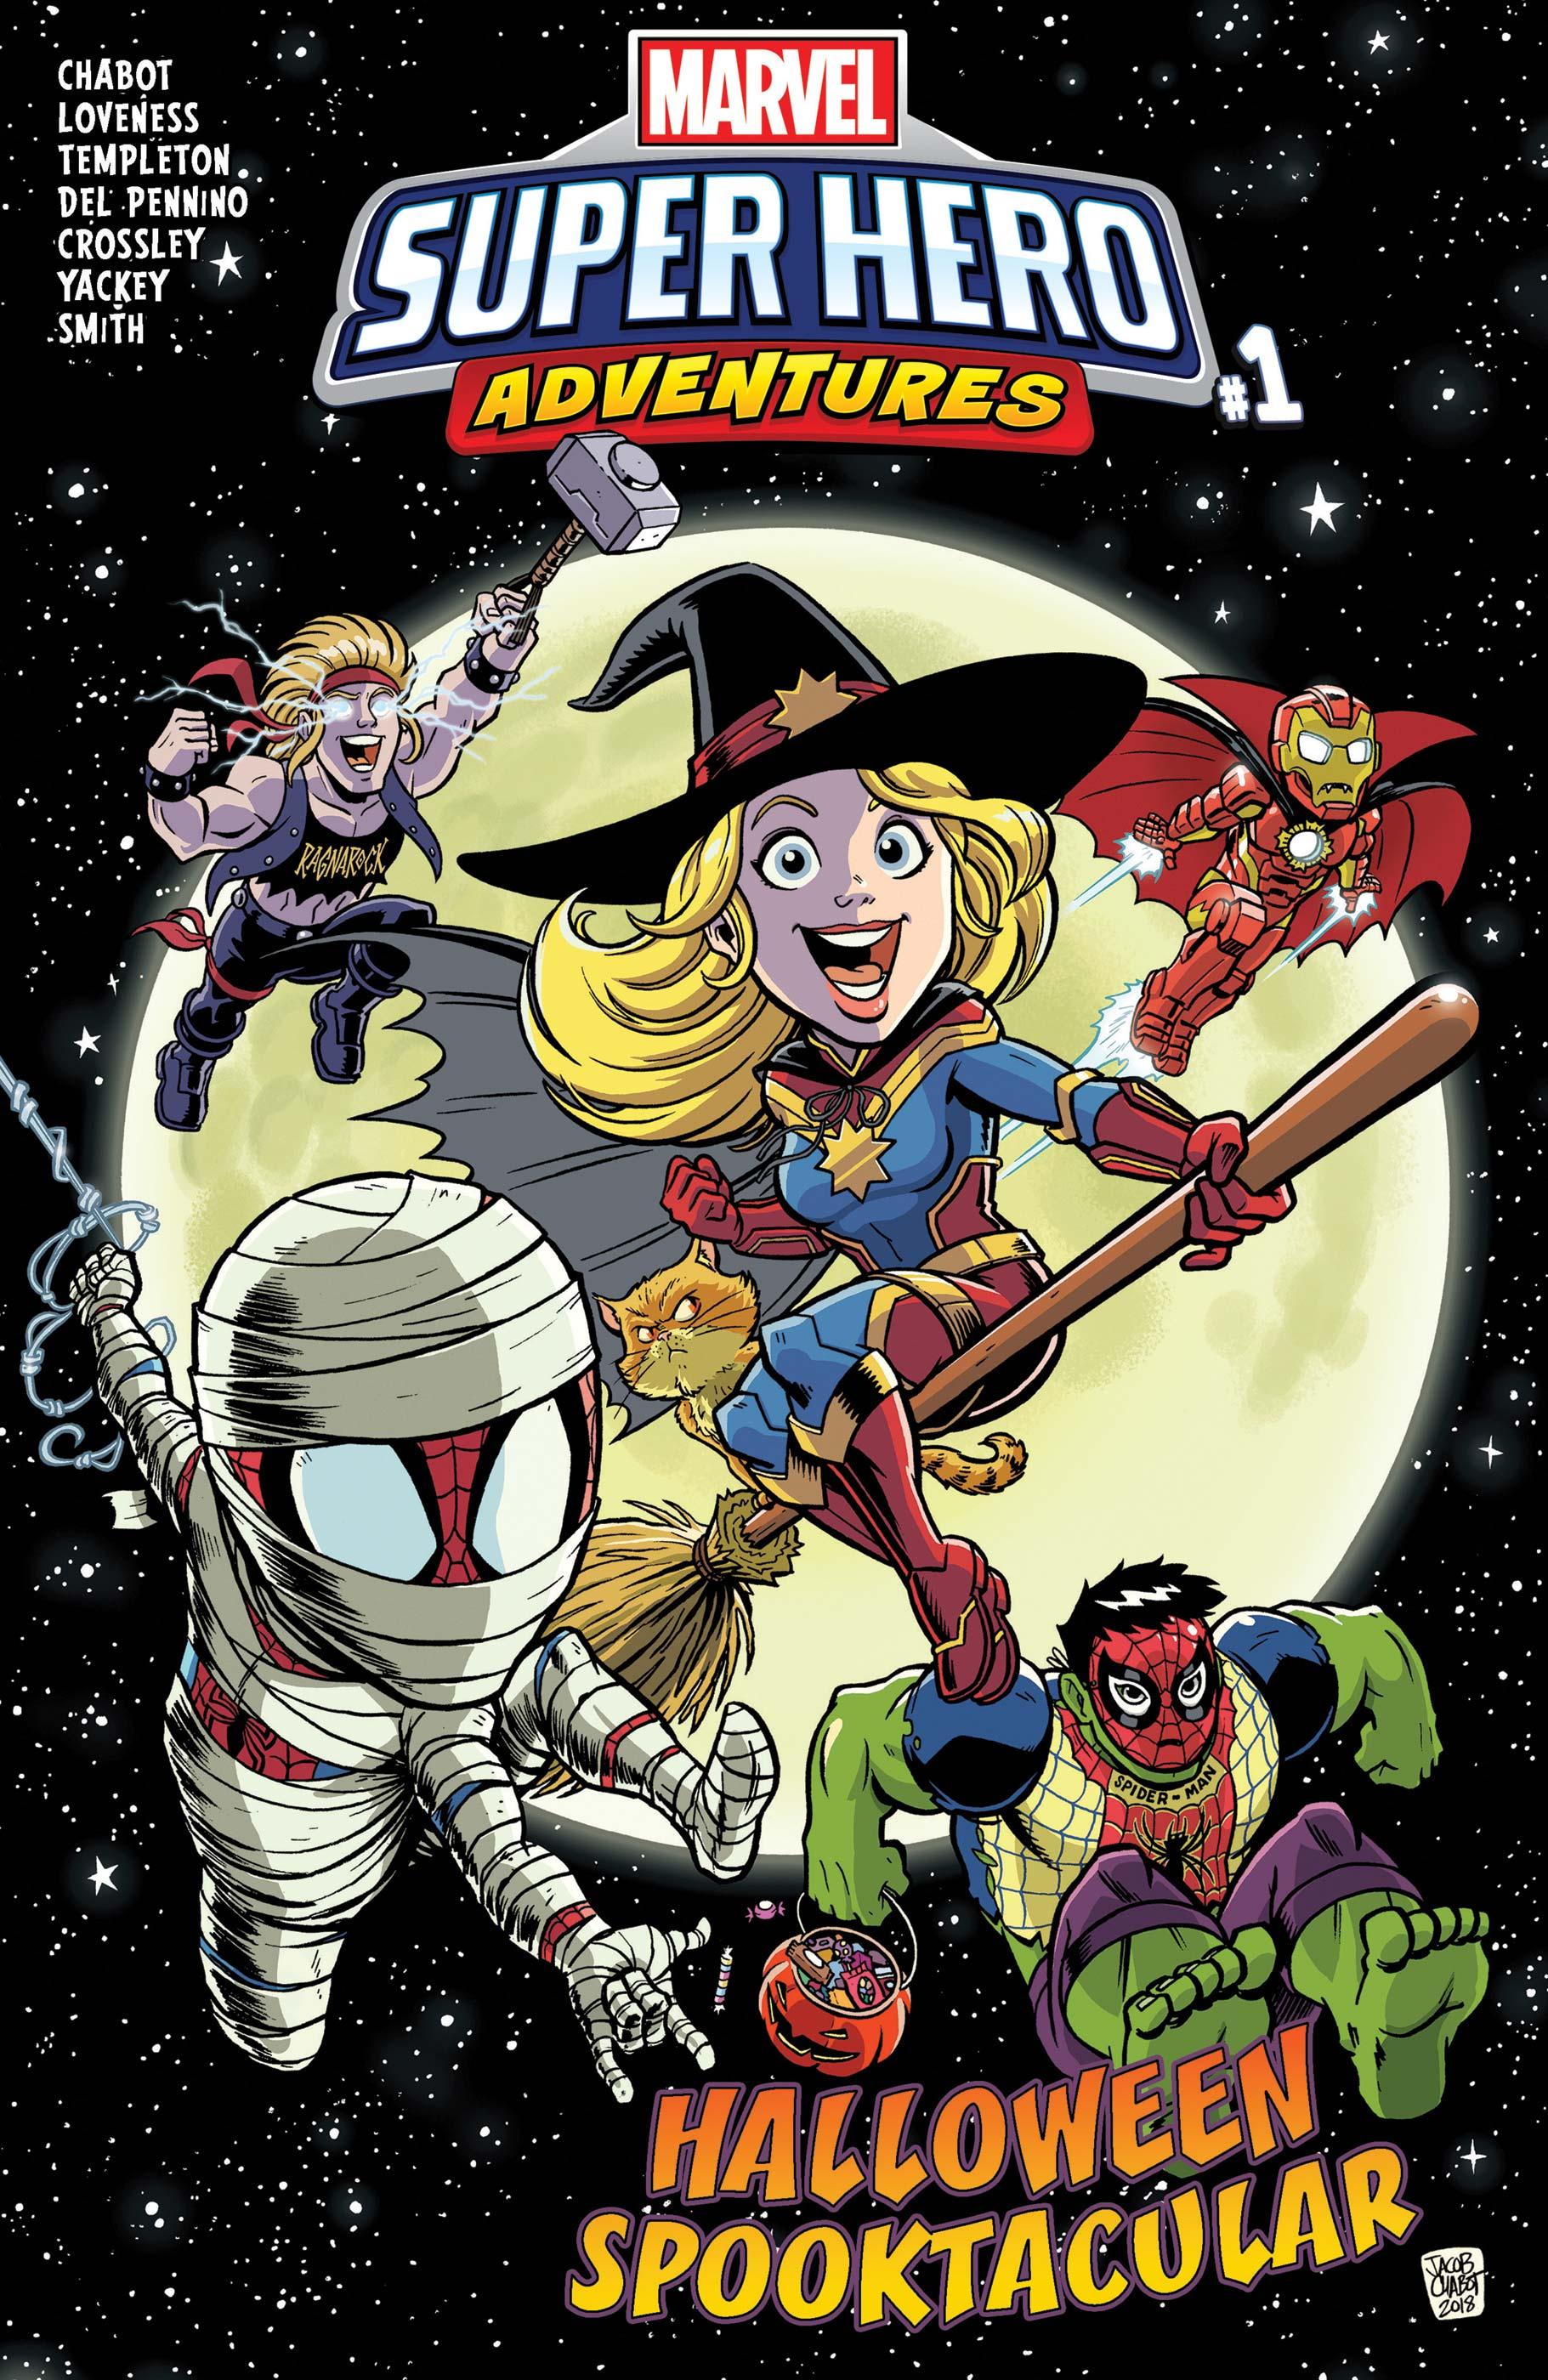 Marvel Super Hero Adventures: Captain Marvel - Halloween Spooktacular Vol 1 1